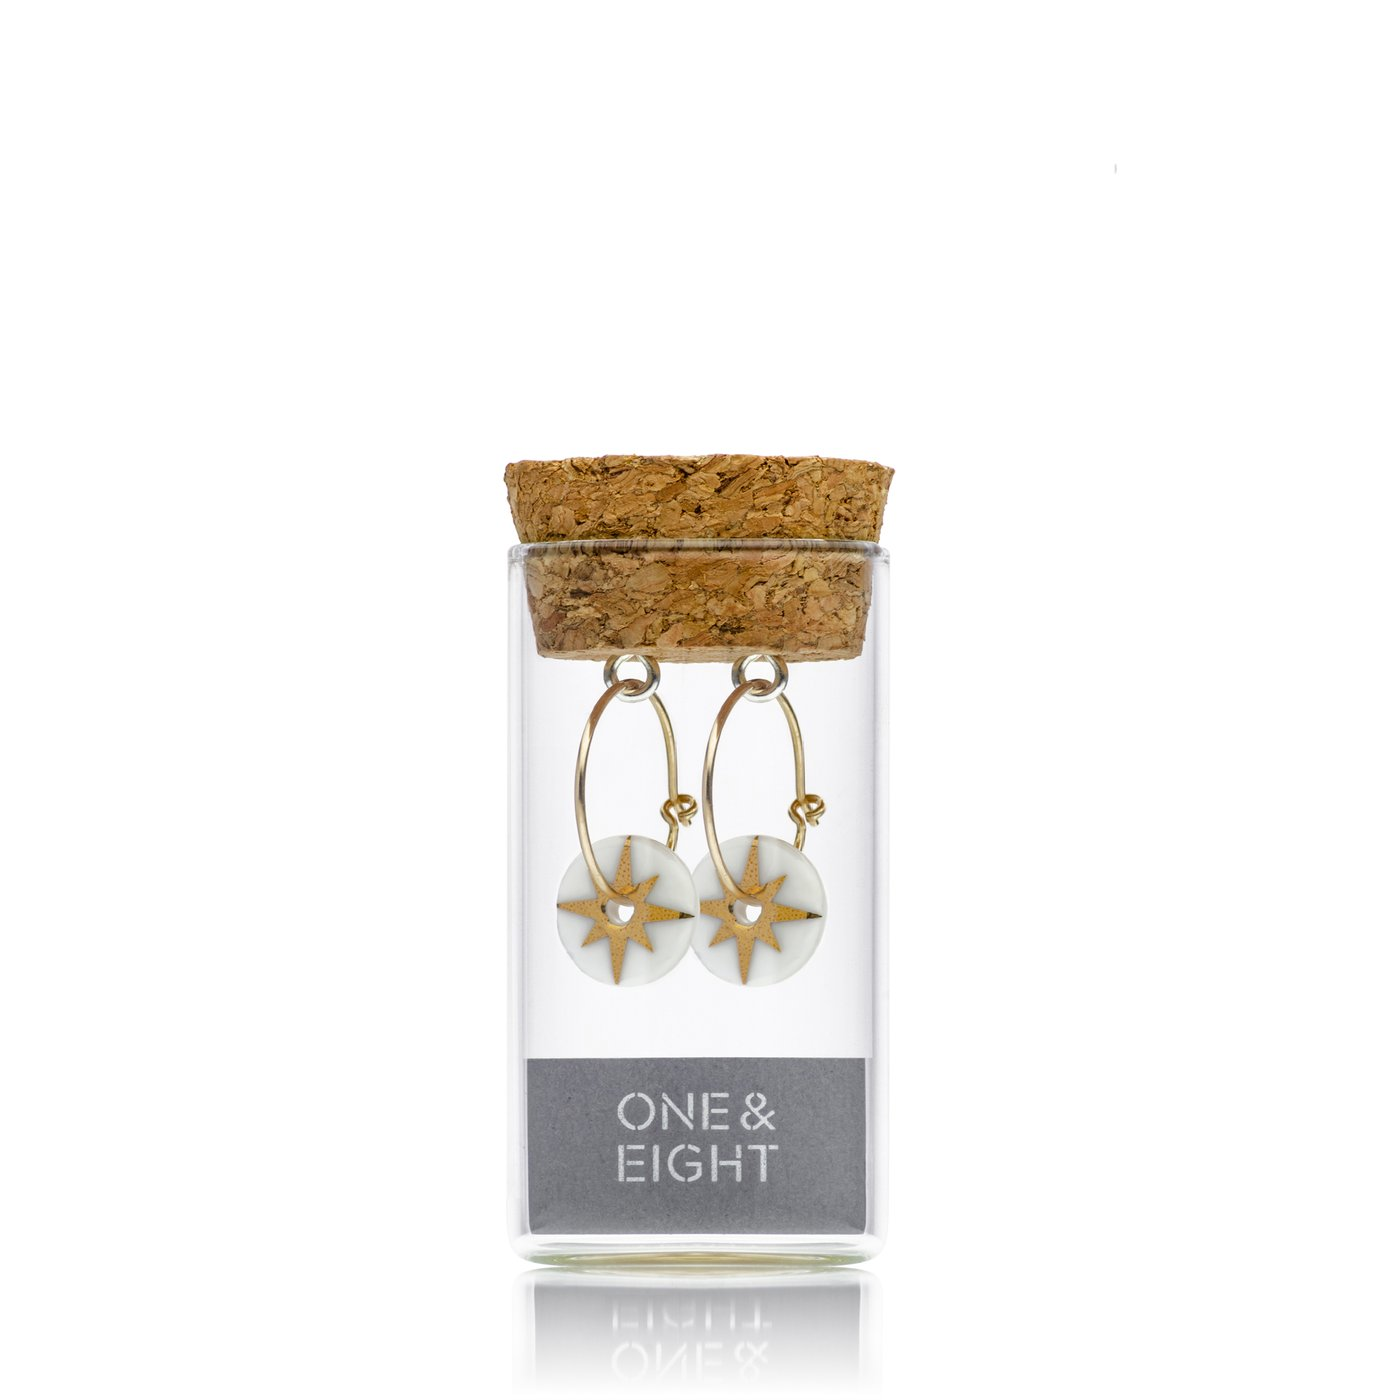 1950 STAR EARRINGS GOLD AND PORCELAIN